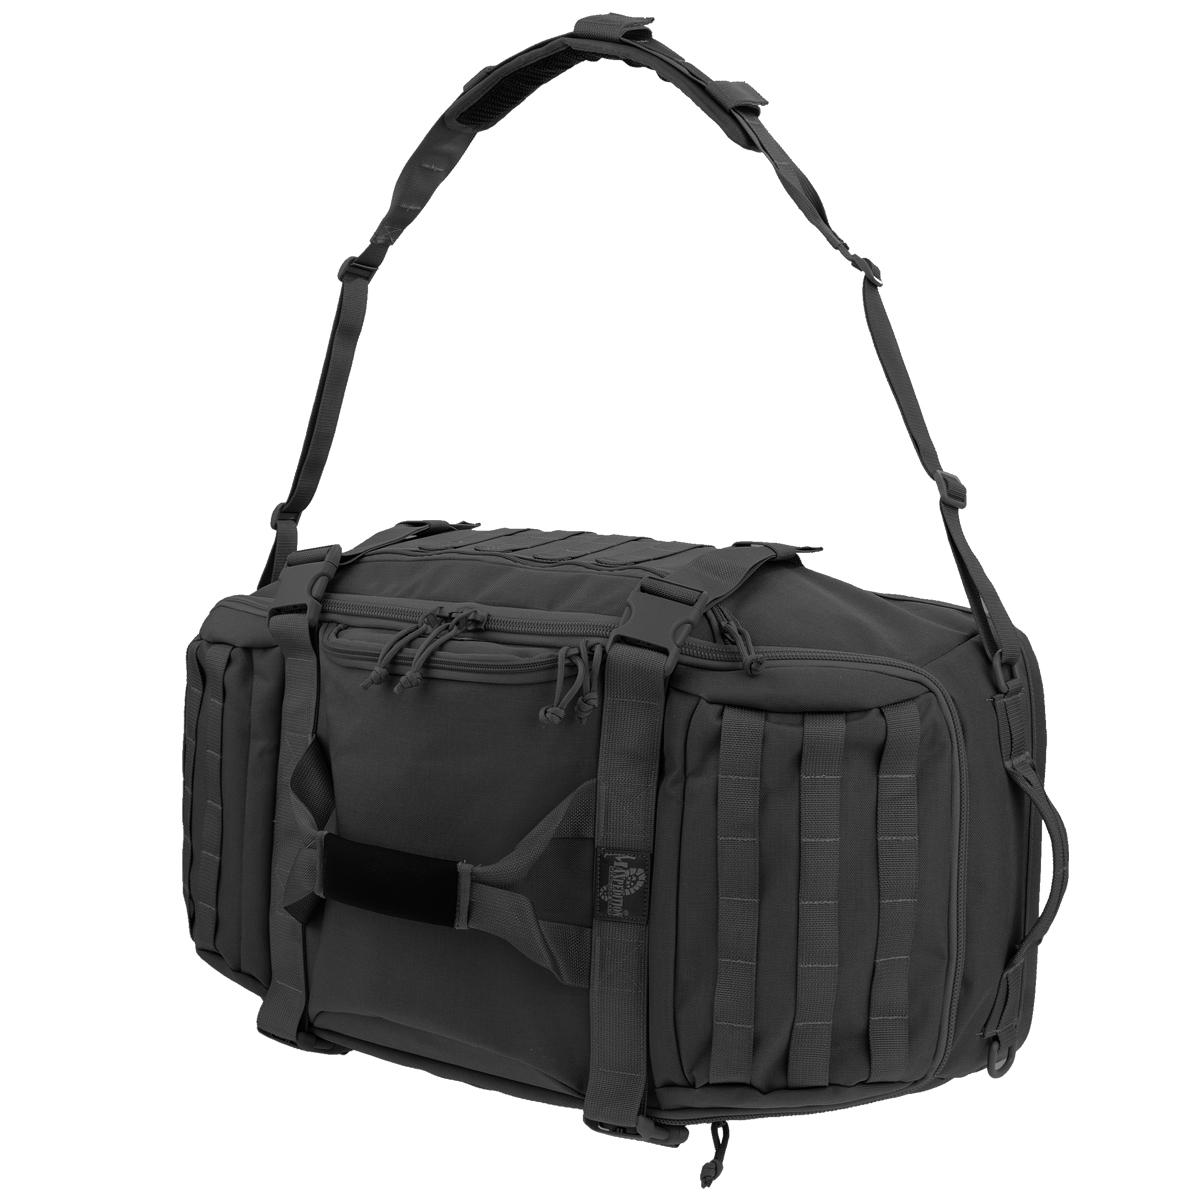 c47b6d1bc47f Sentinel Maxpedition Doppelduffel Adventure Bag MOLLE Army Pack Carryall  Gym Bag Black